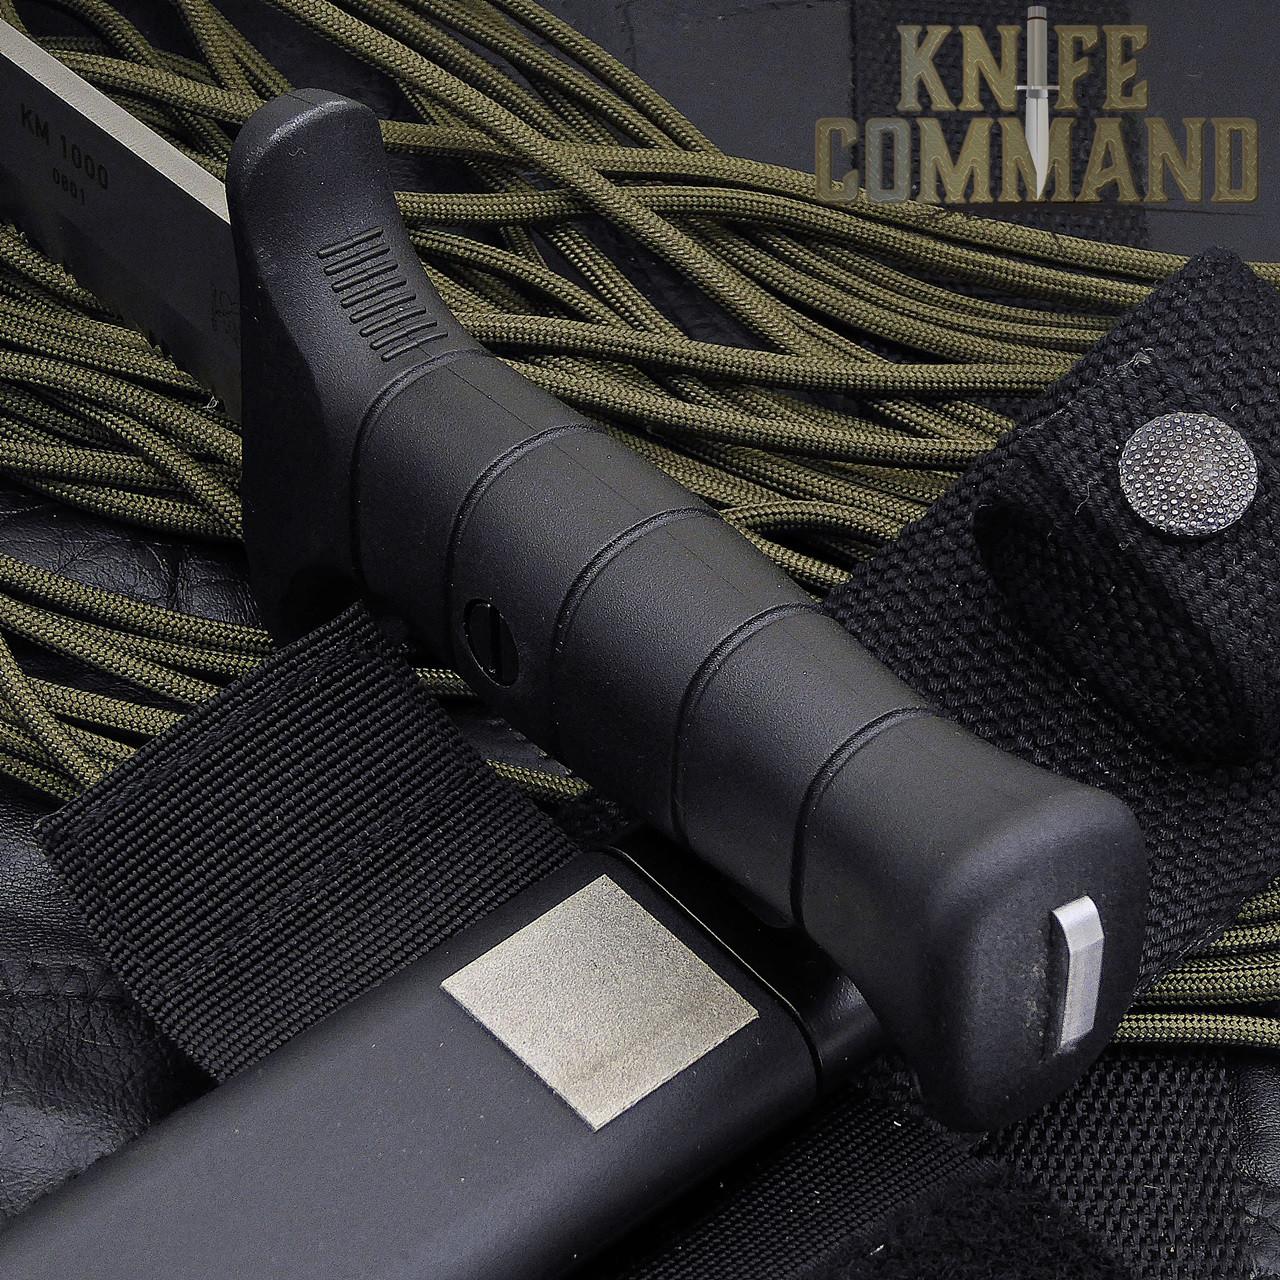 Eickhorn Solingen KM 1000 Combat Knife.  Tang through handle and sharpener on sheath.